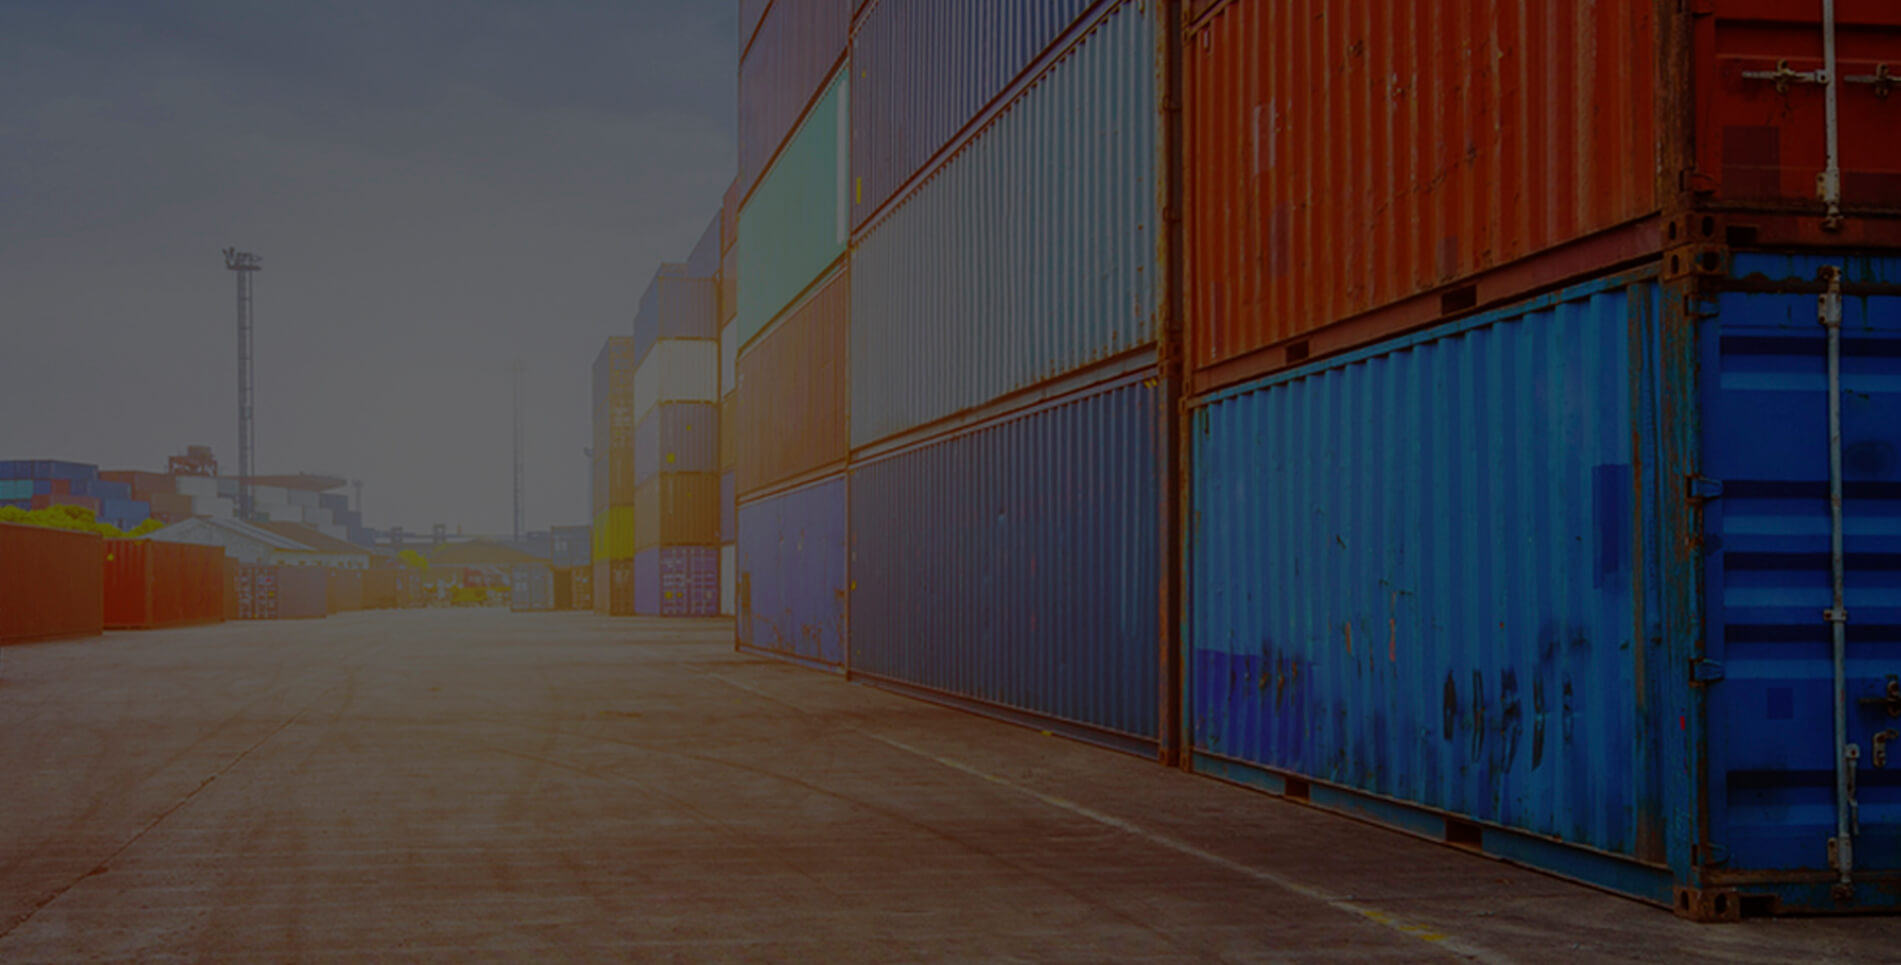 Procurando Container/Contêineres?